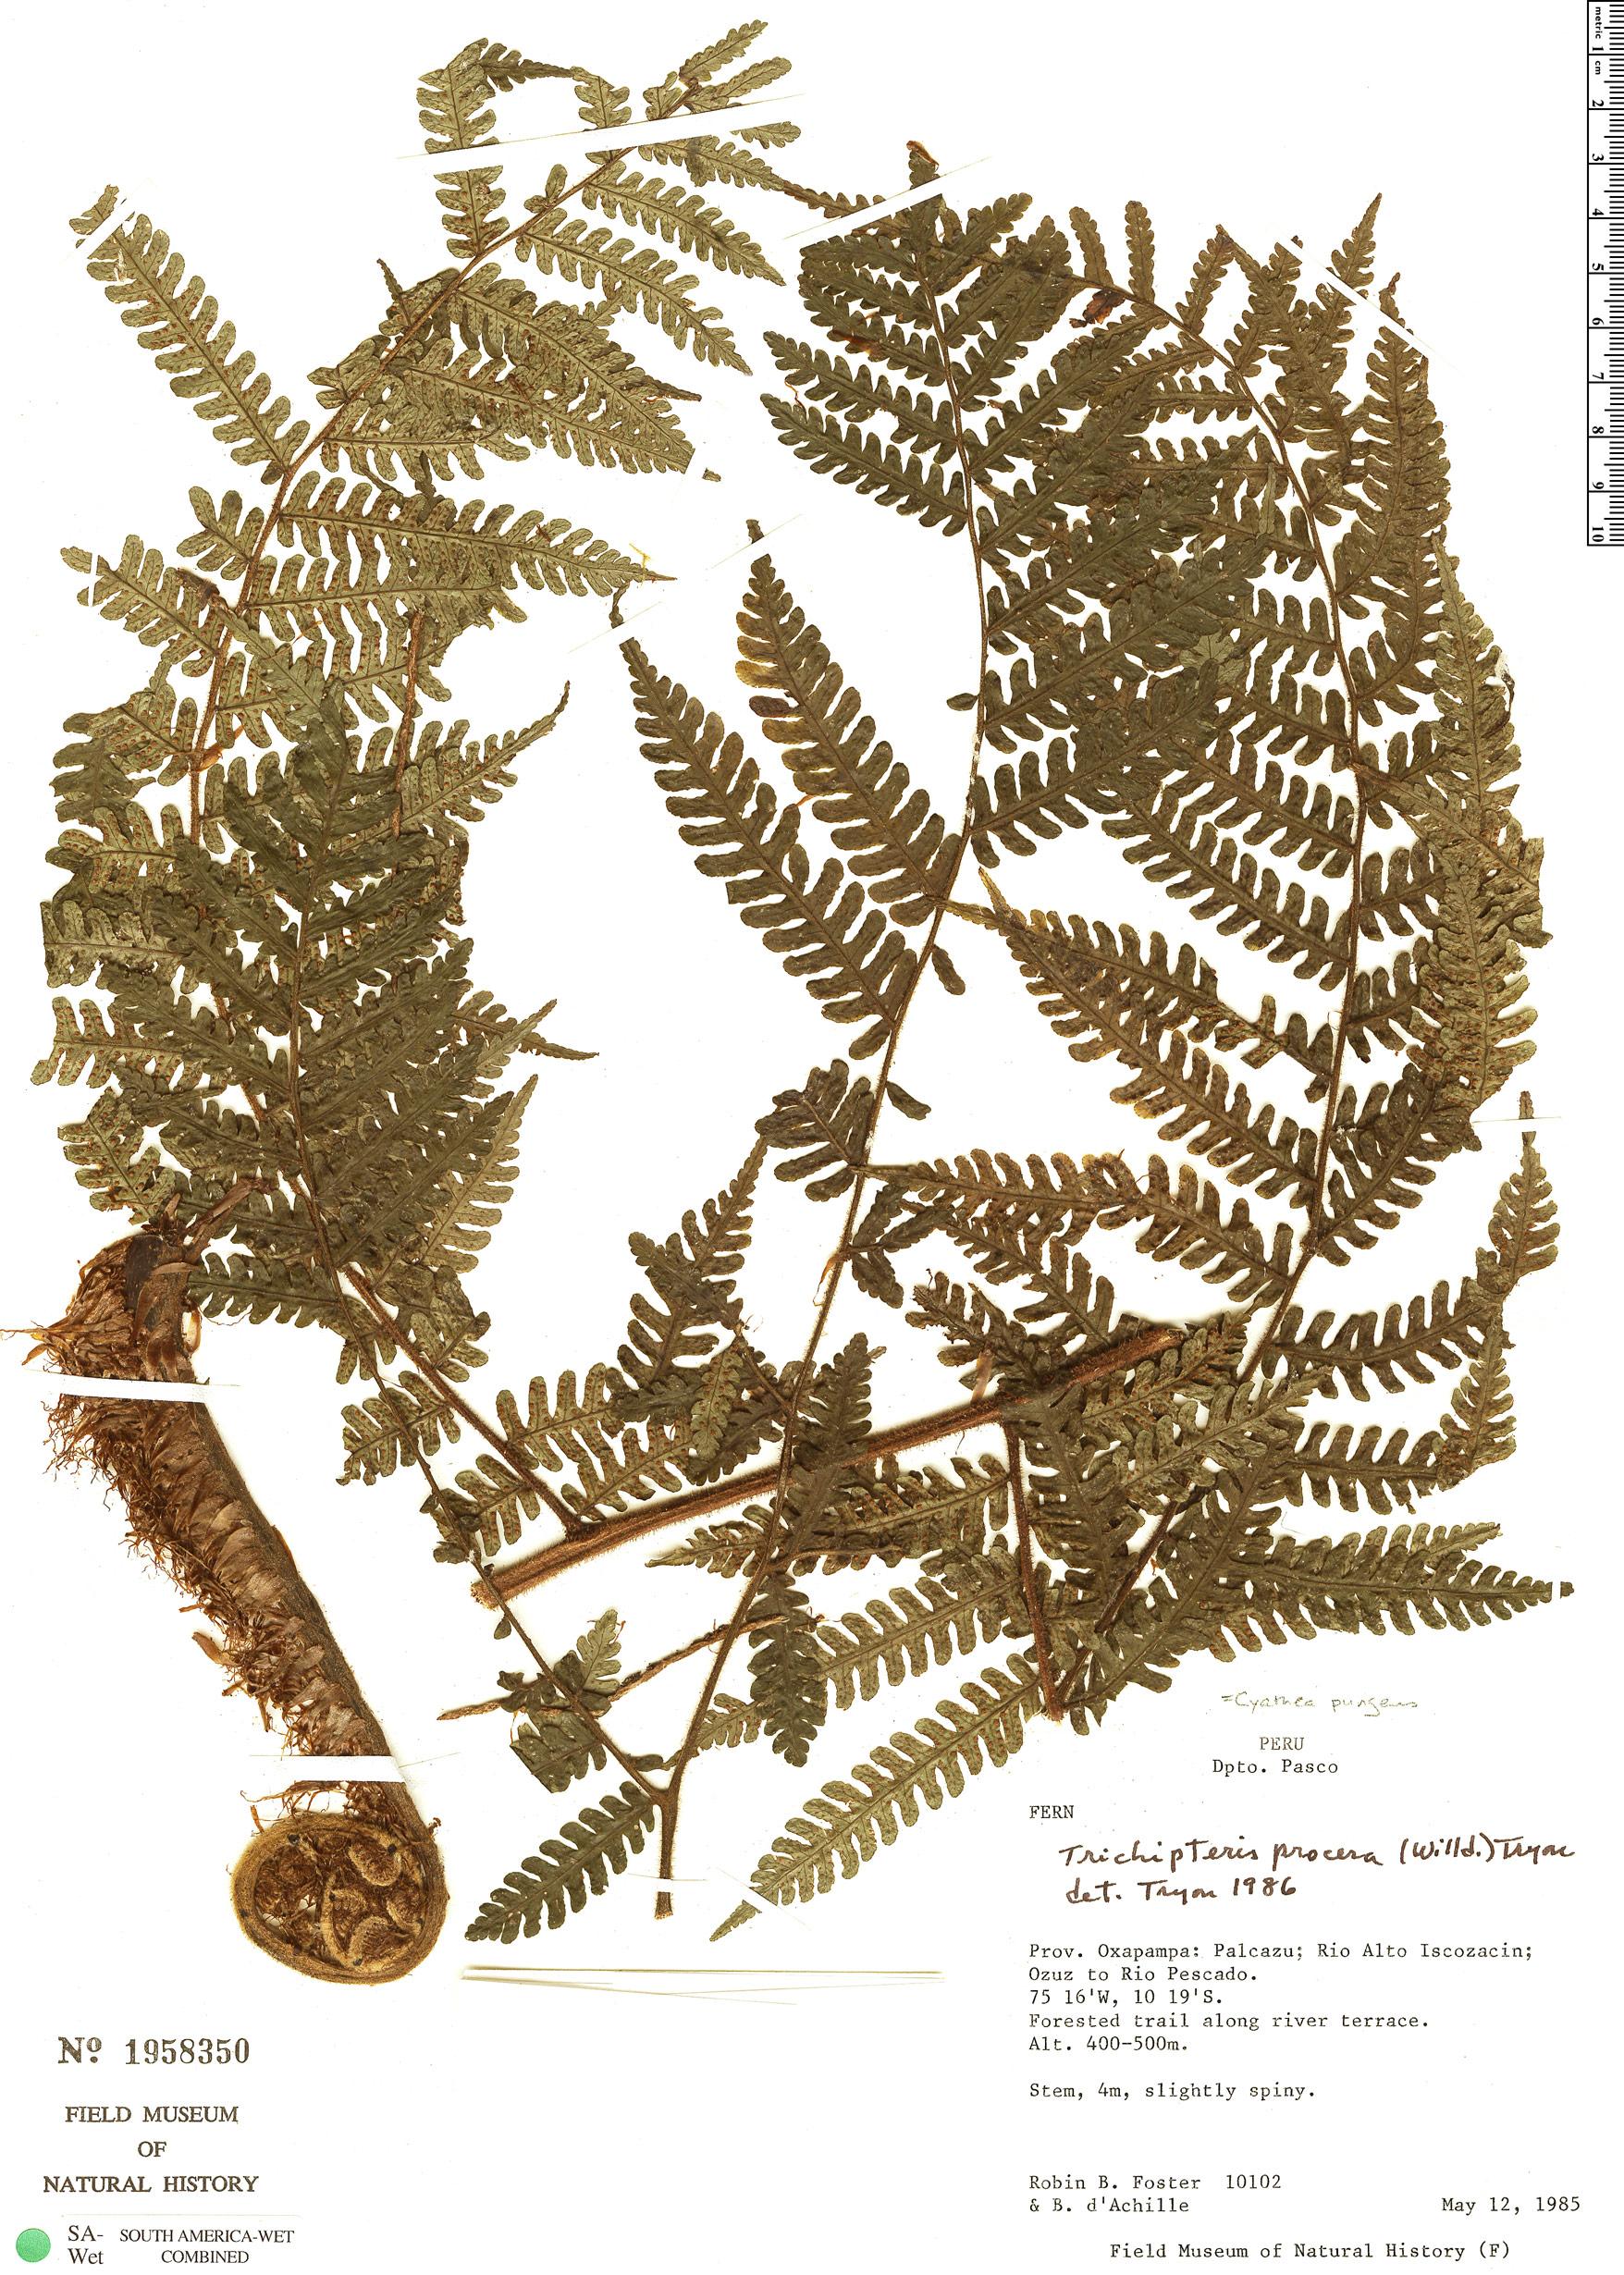 Specimen: Cyathea pungens